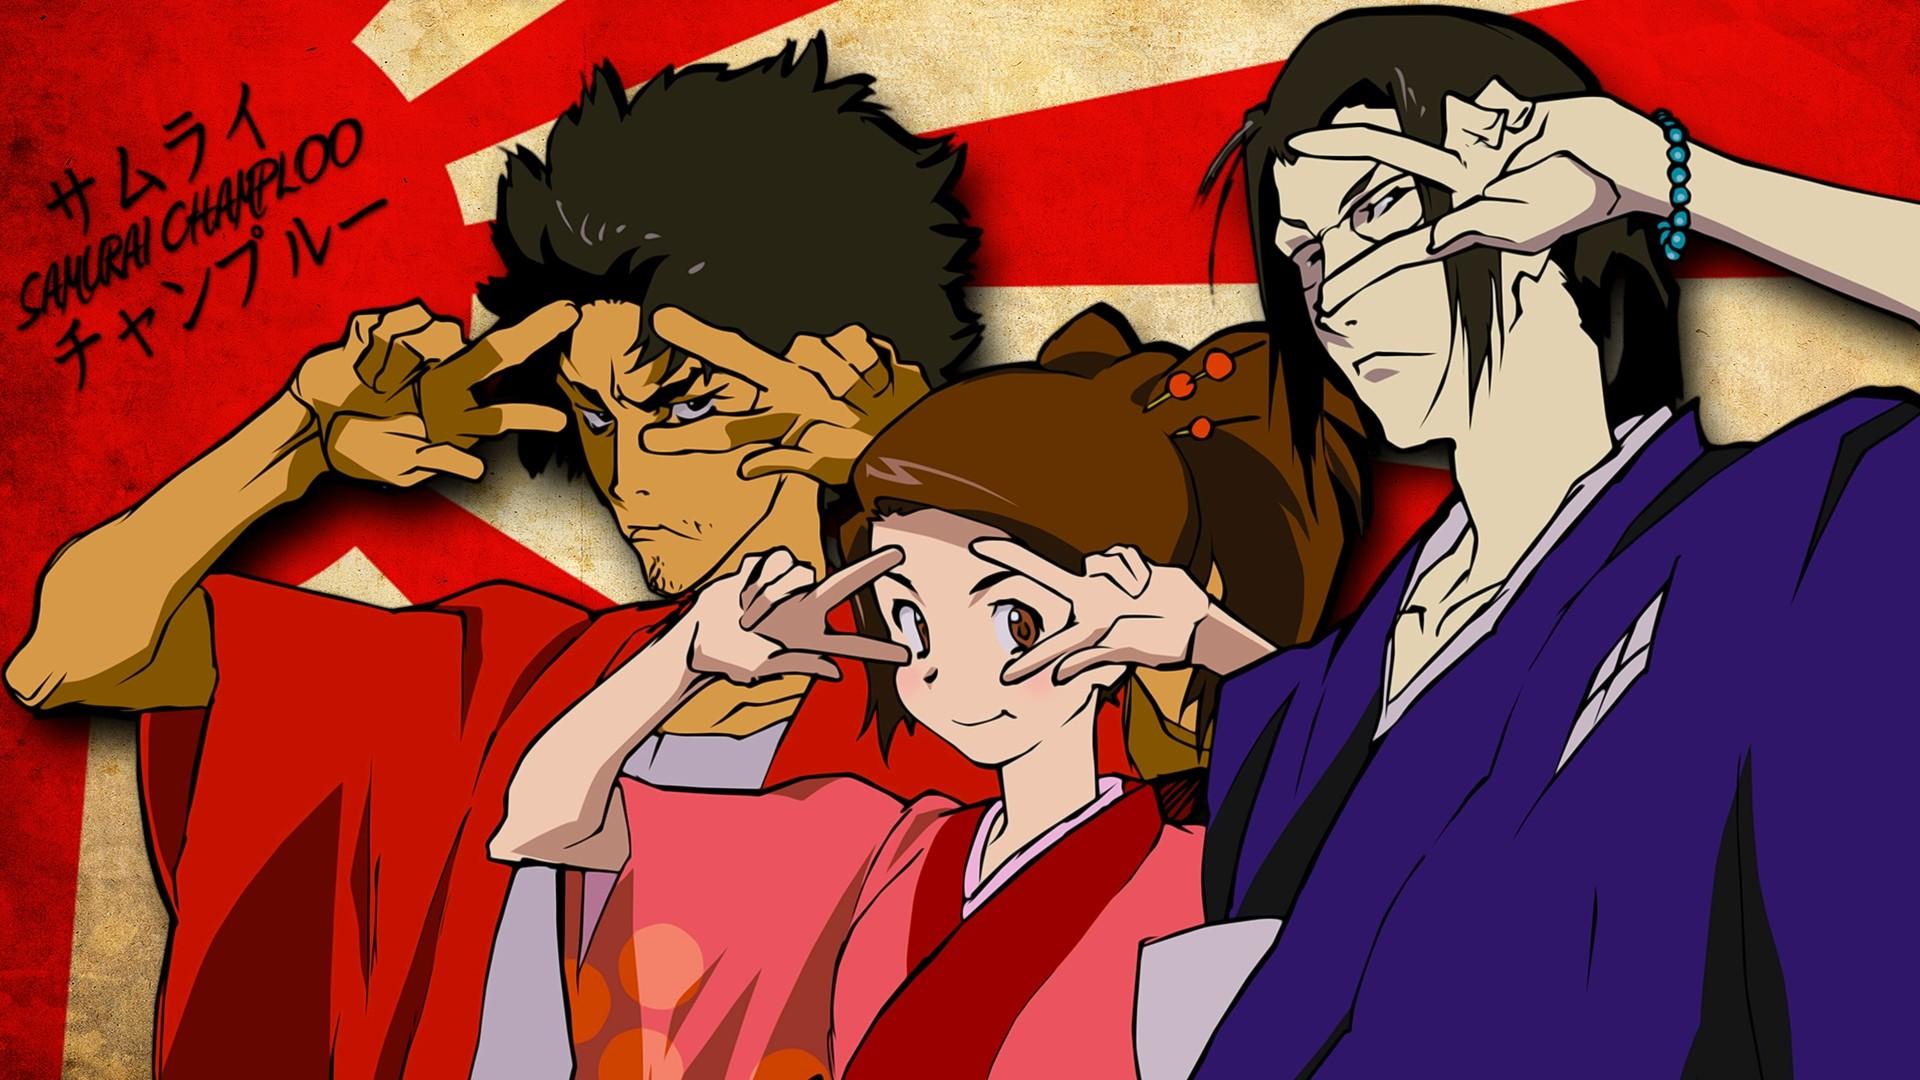 4870894-4419385695-Mugen.jpg (1200×661) | Bushida | Pinterest | Samurai,  Anime and Hottest anime characters